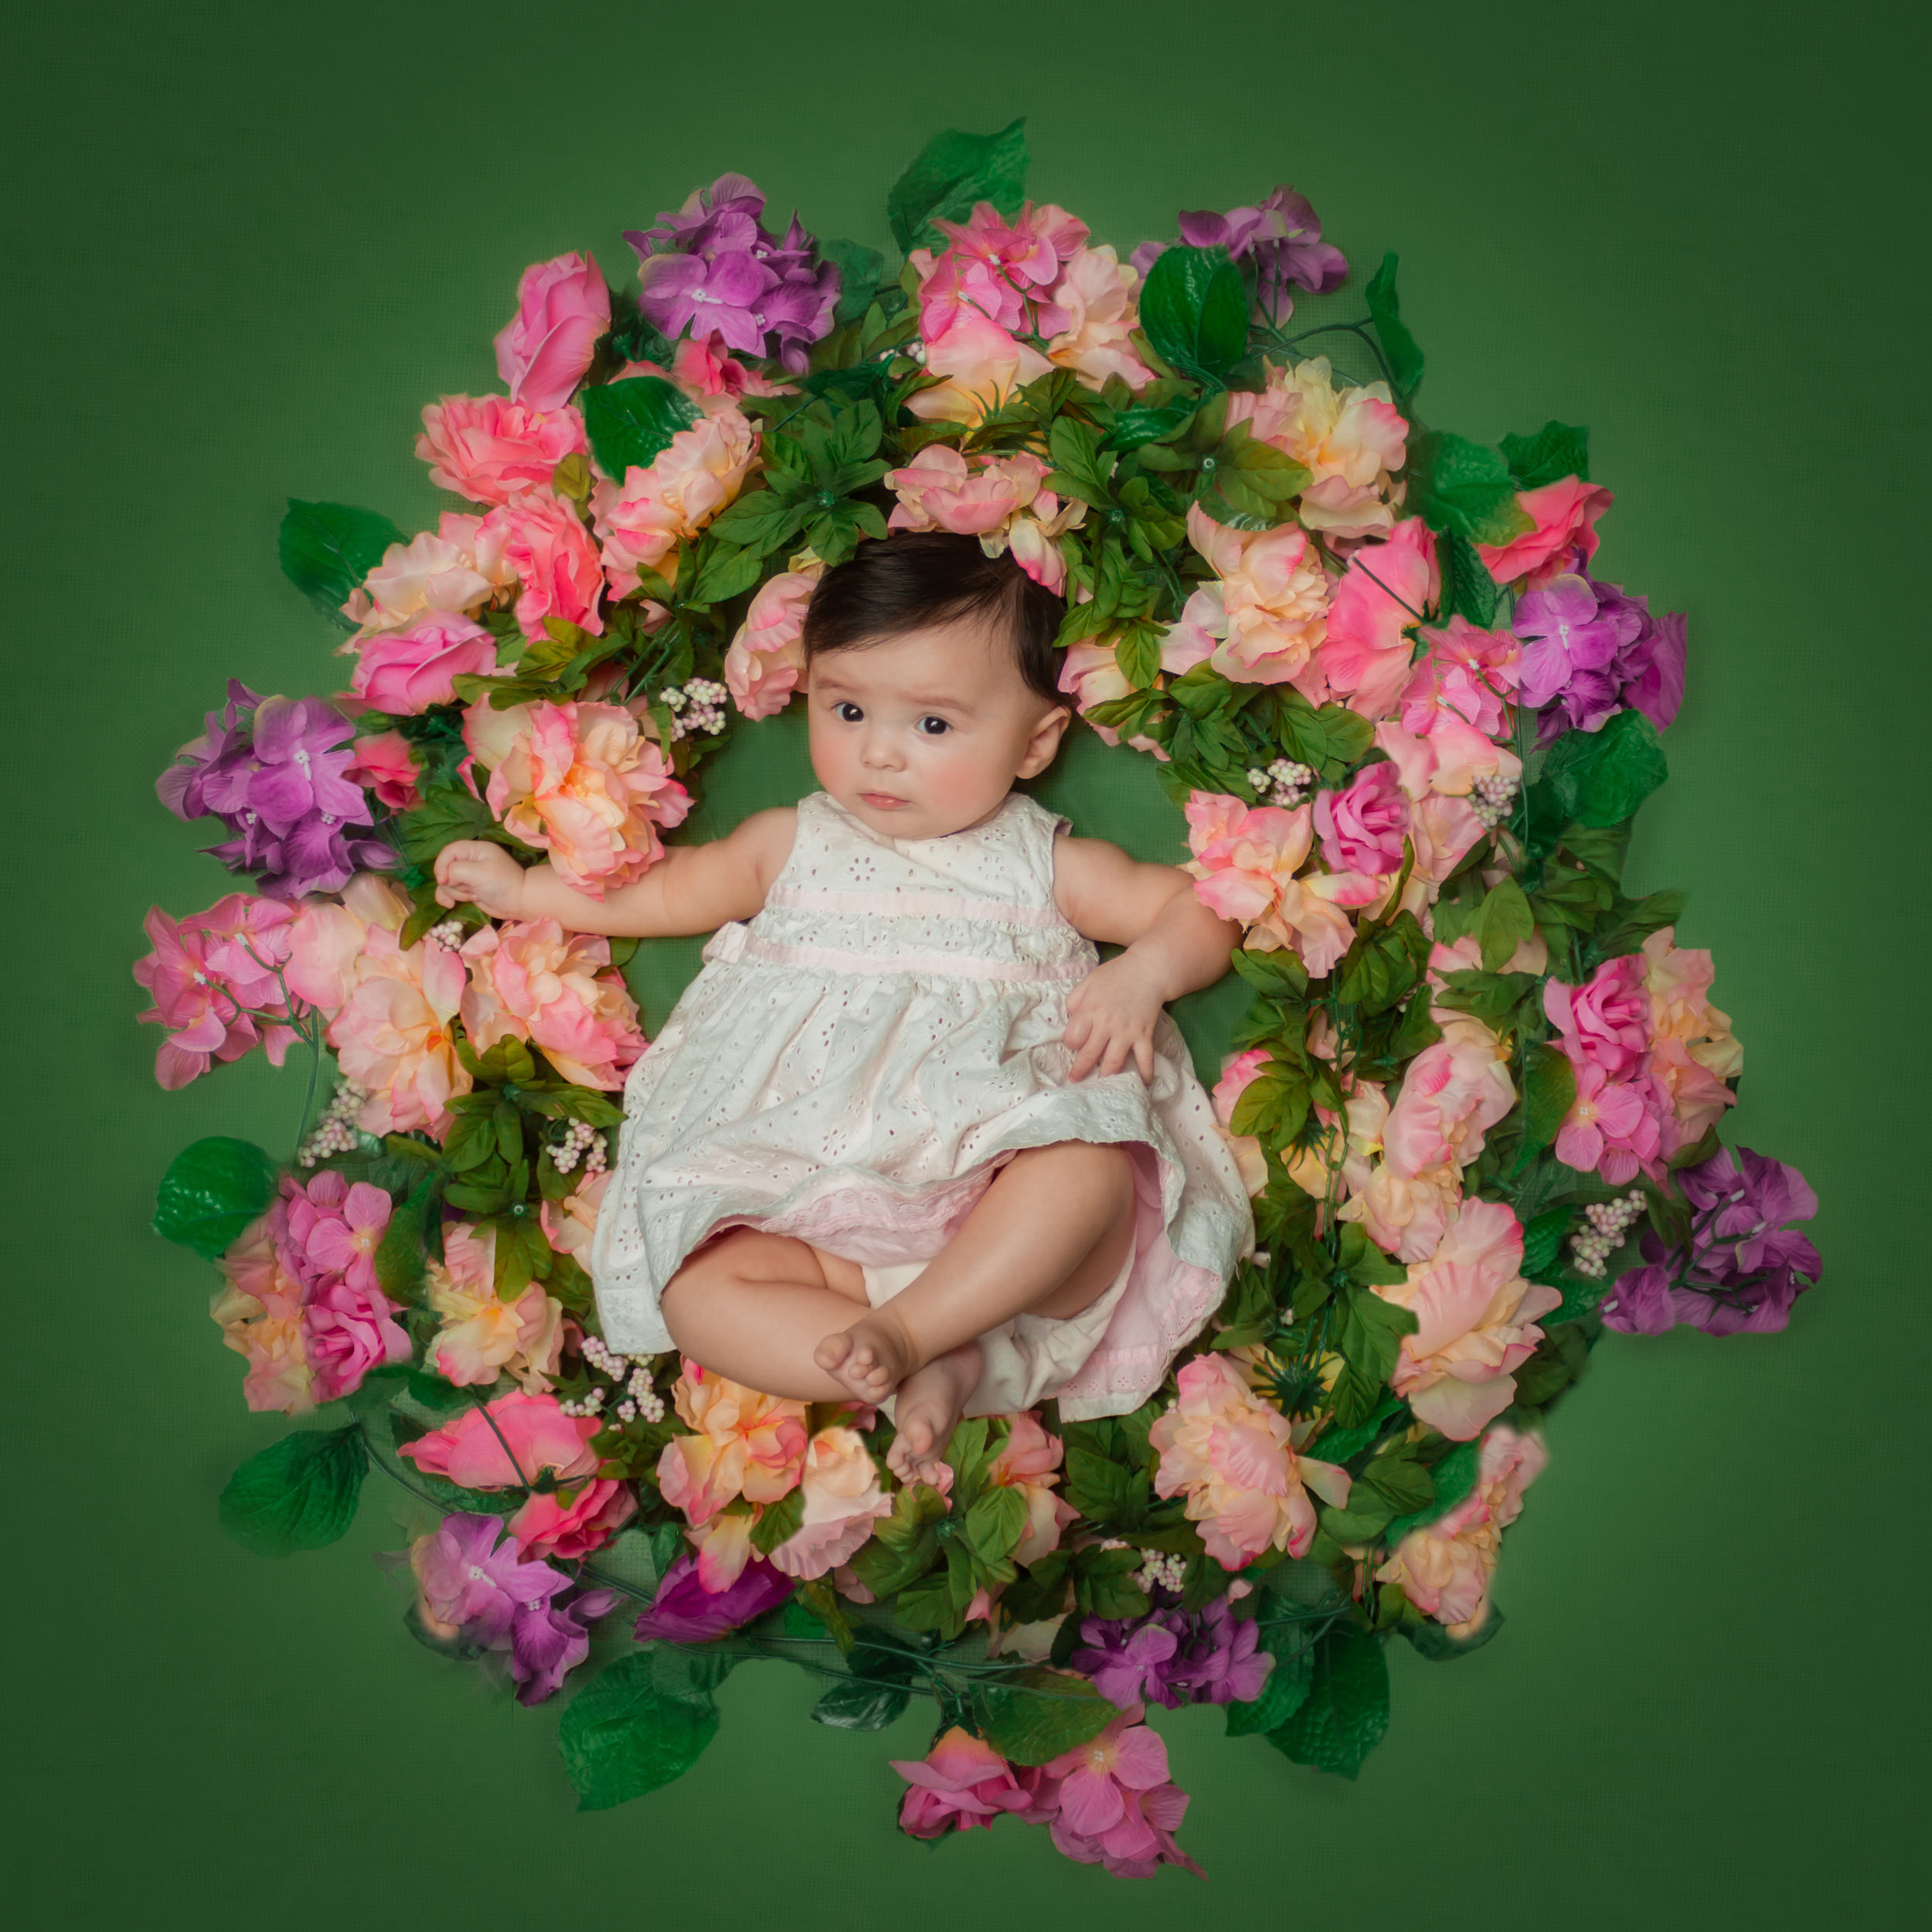 Flowers no logo.jpg